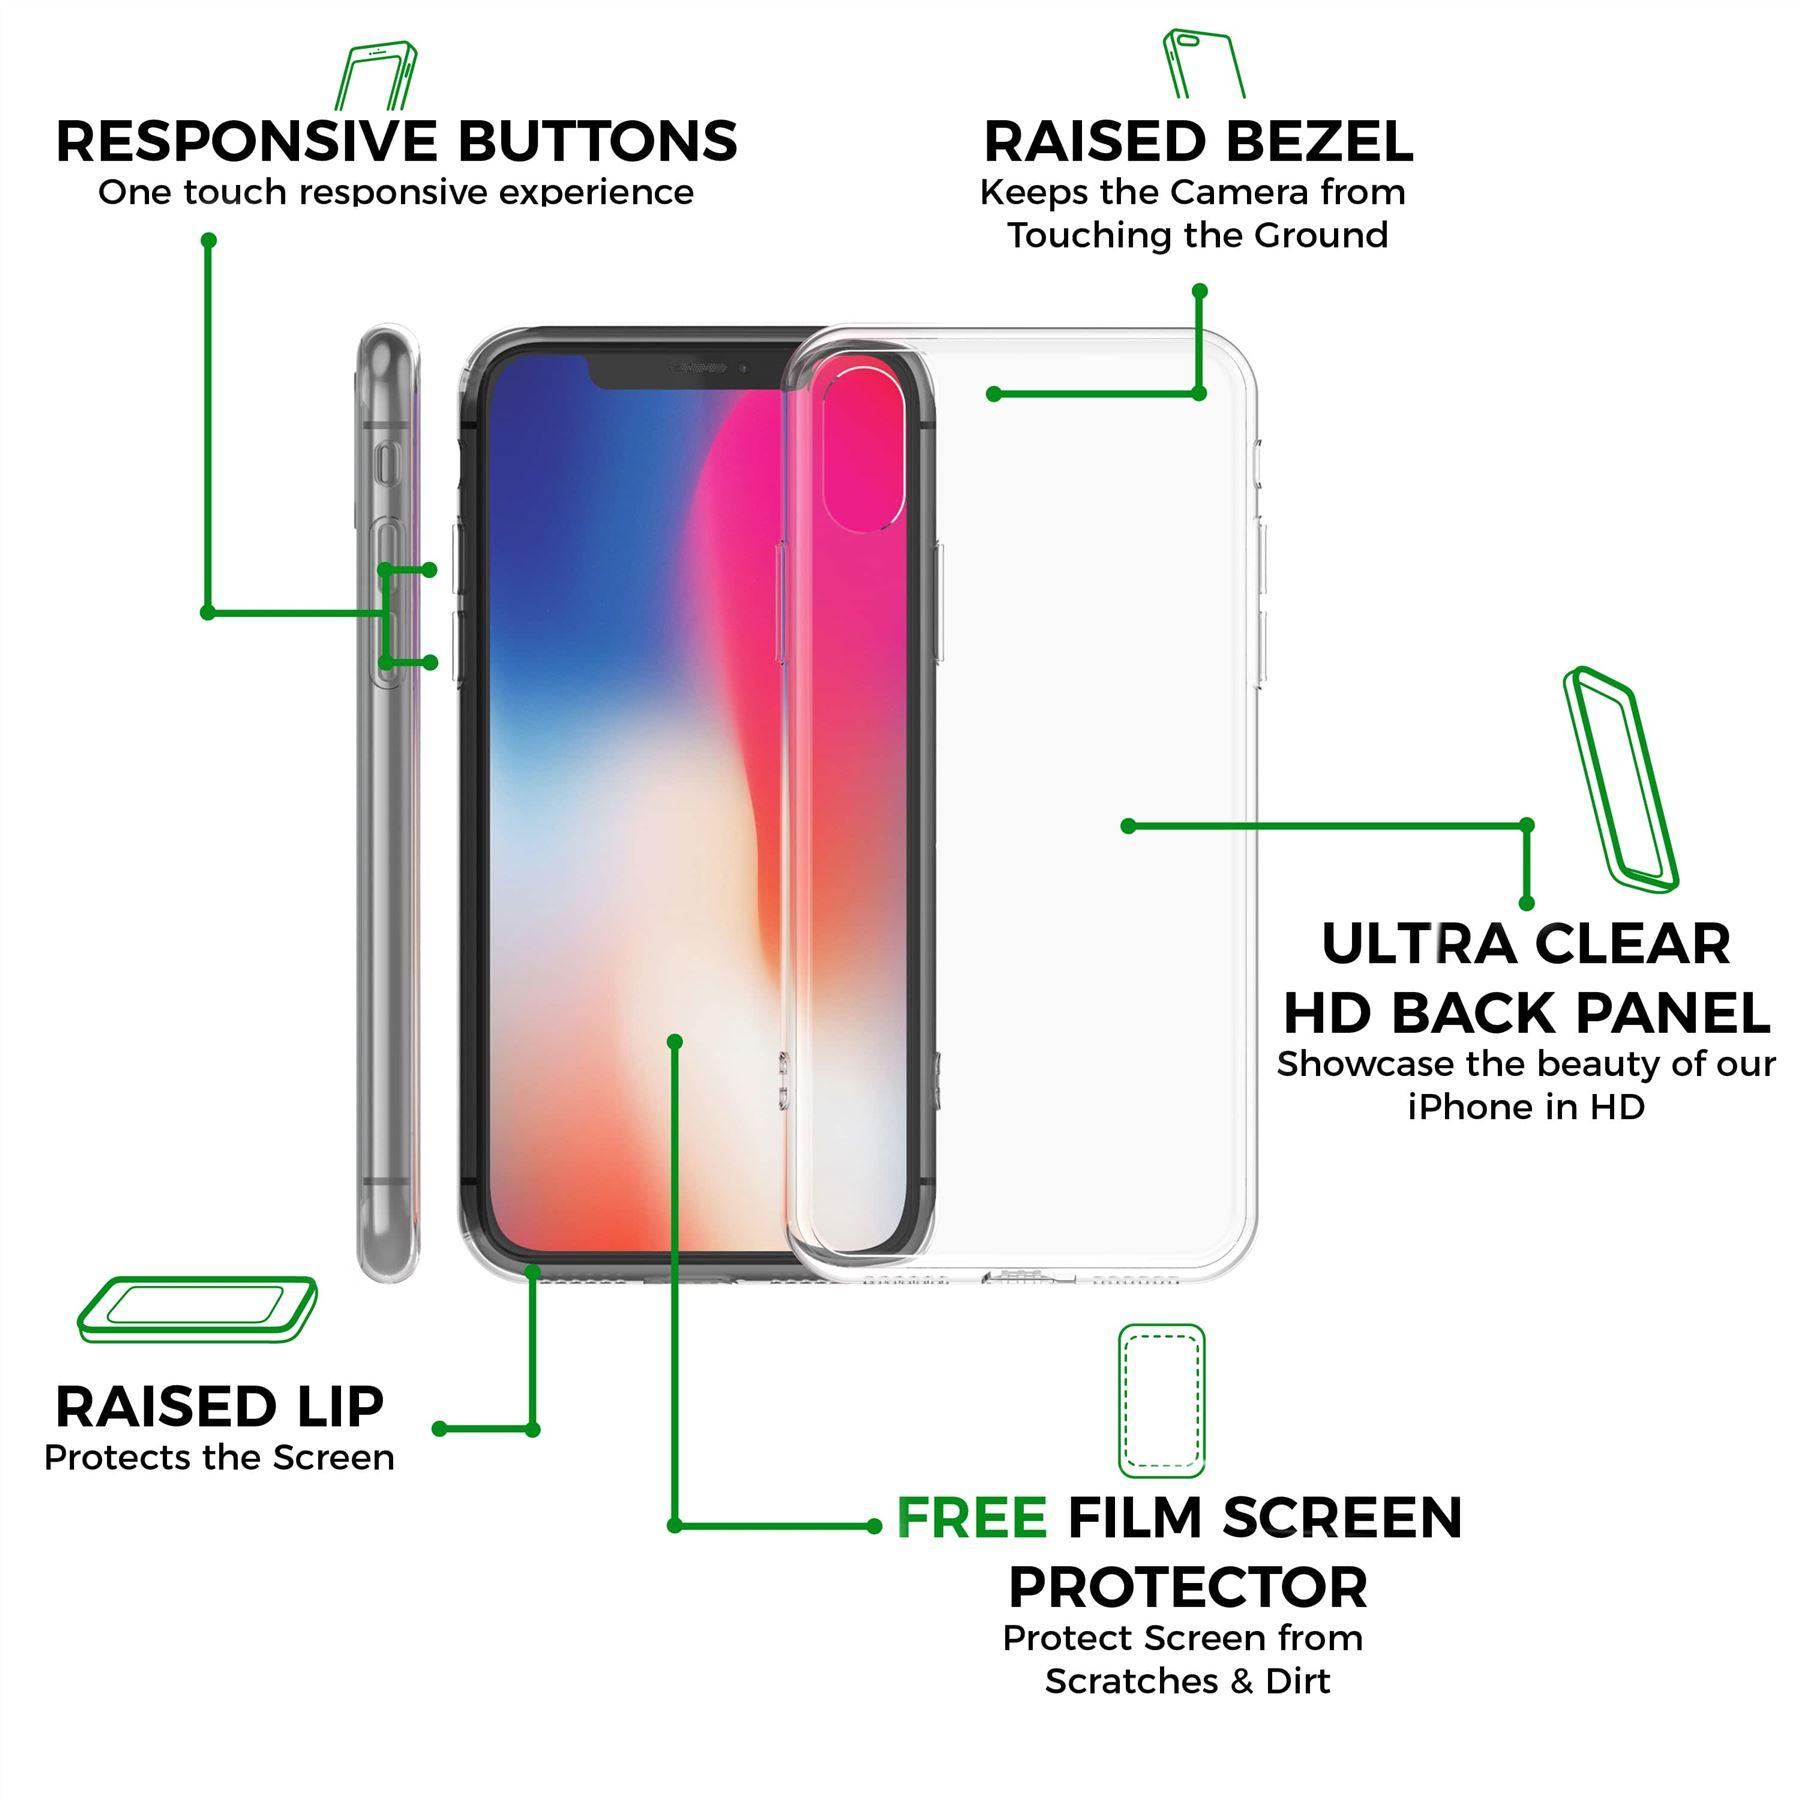 thumbnail 15 - For Apple iPhone XR Xs Max X 8 7 Plus 6 5 Se Case Cover Clear Transparent CS283